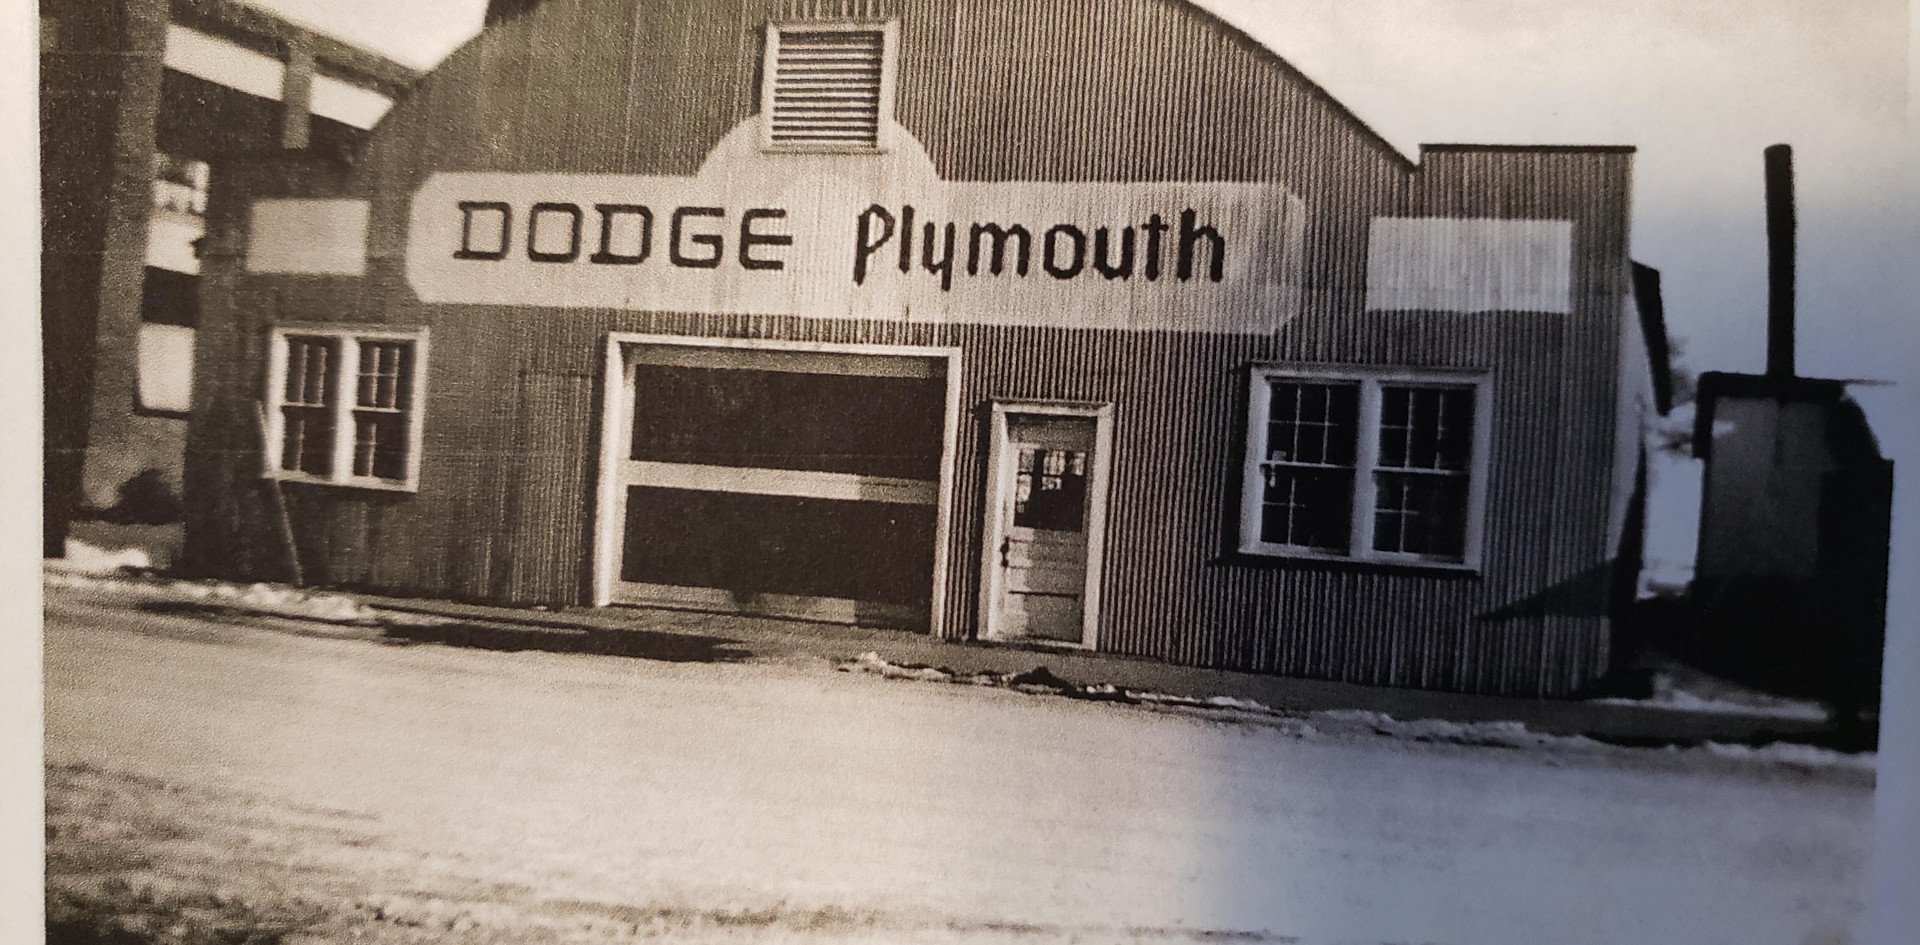 Dodge Plymouth.jpg